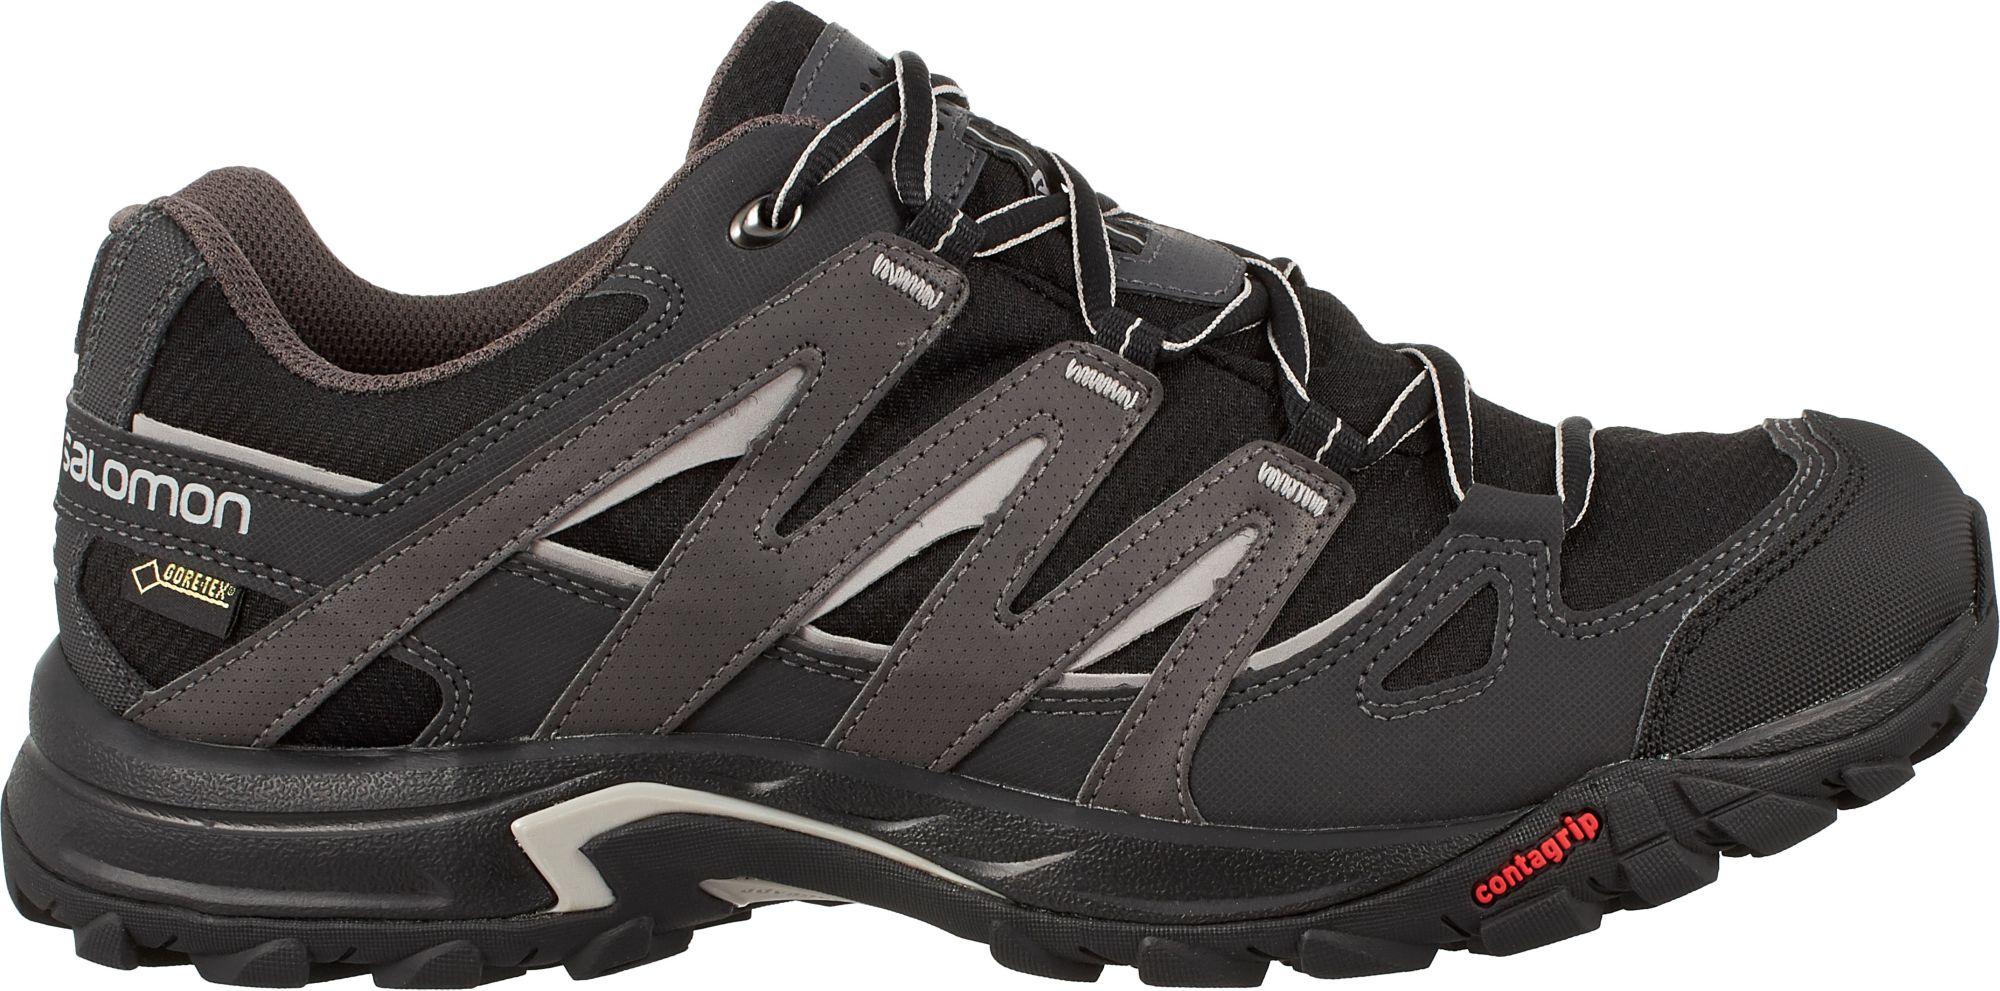 gore tex shoes salomon menu0027s eskape gore-tex hiking shoes orhbtph